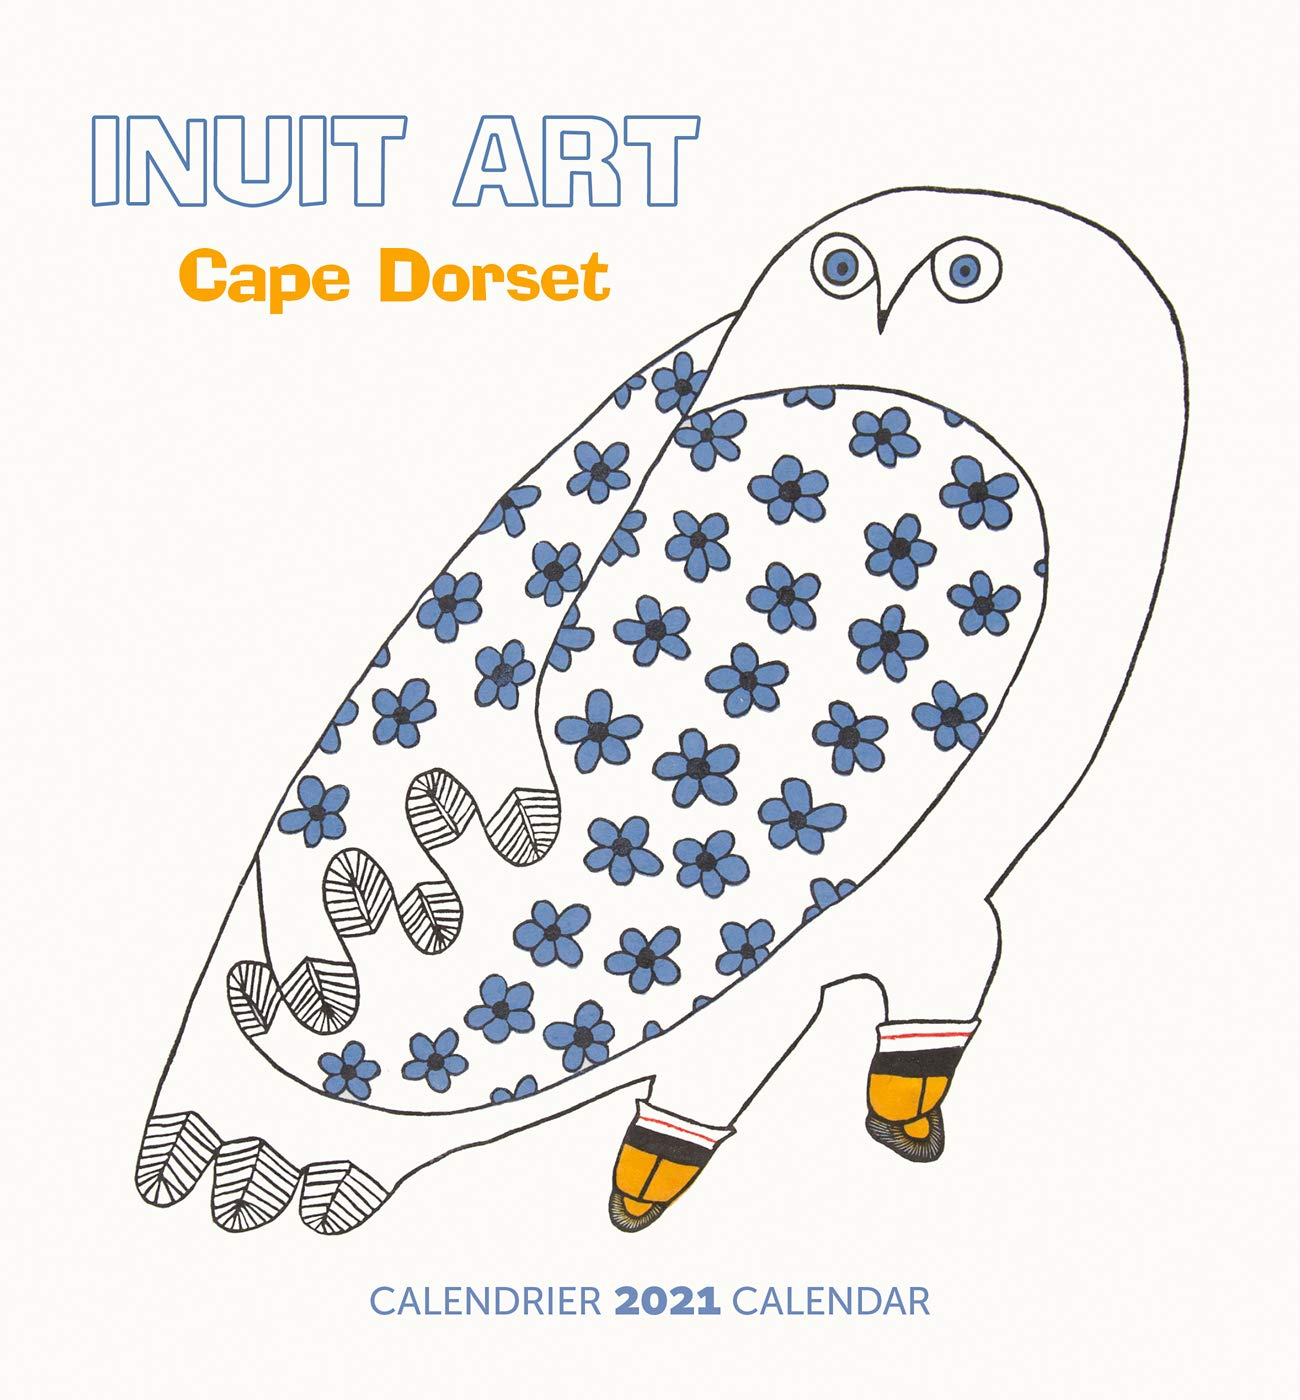 Inuit Art: Cape Dorset Calendrier 2021 Mini Wall Calendar (English